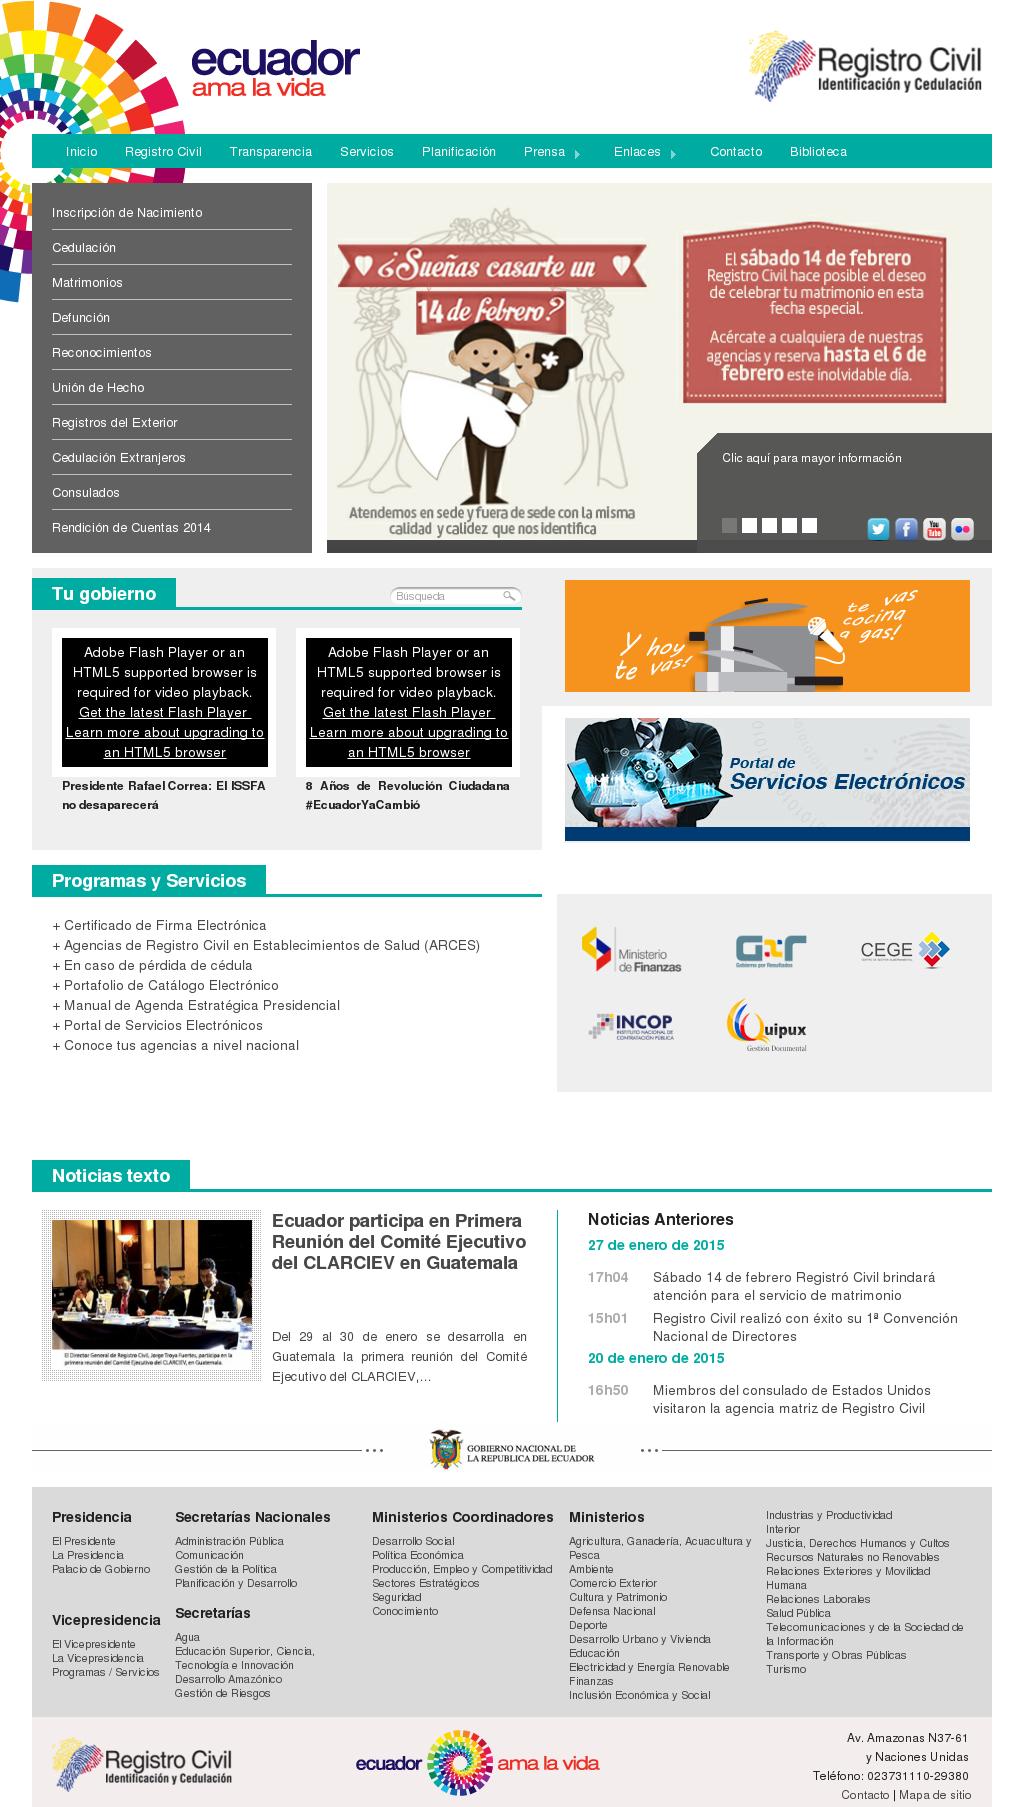 Registro civil del ecuador online dating